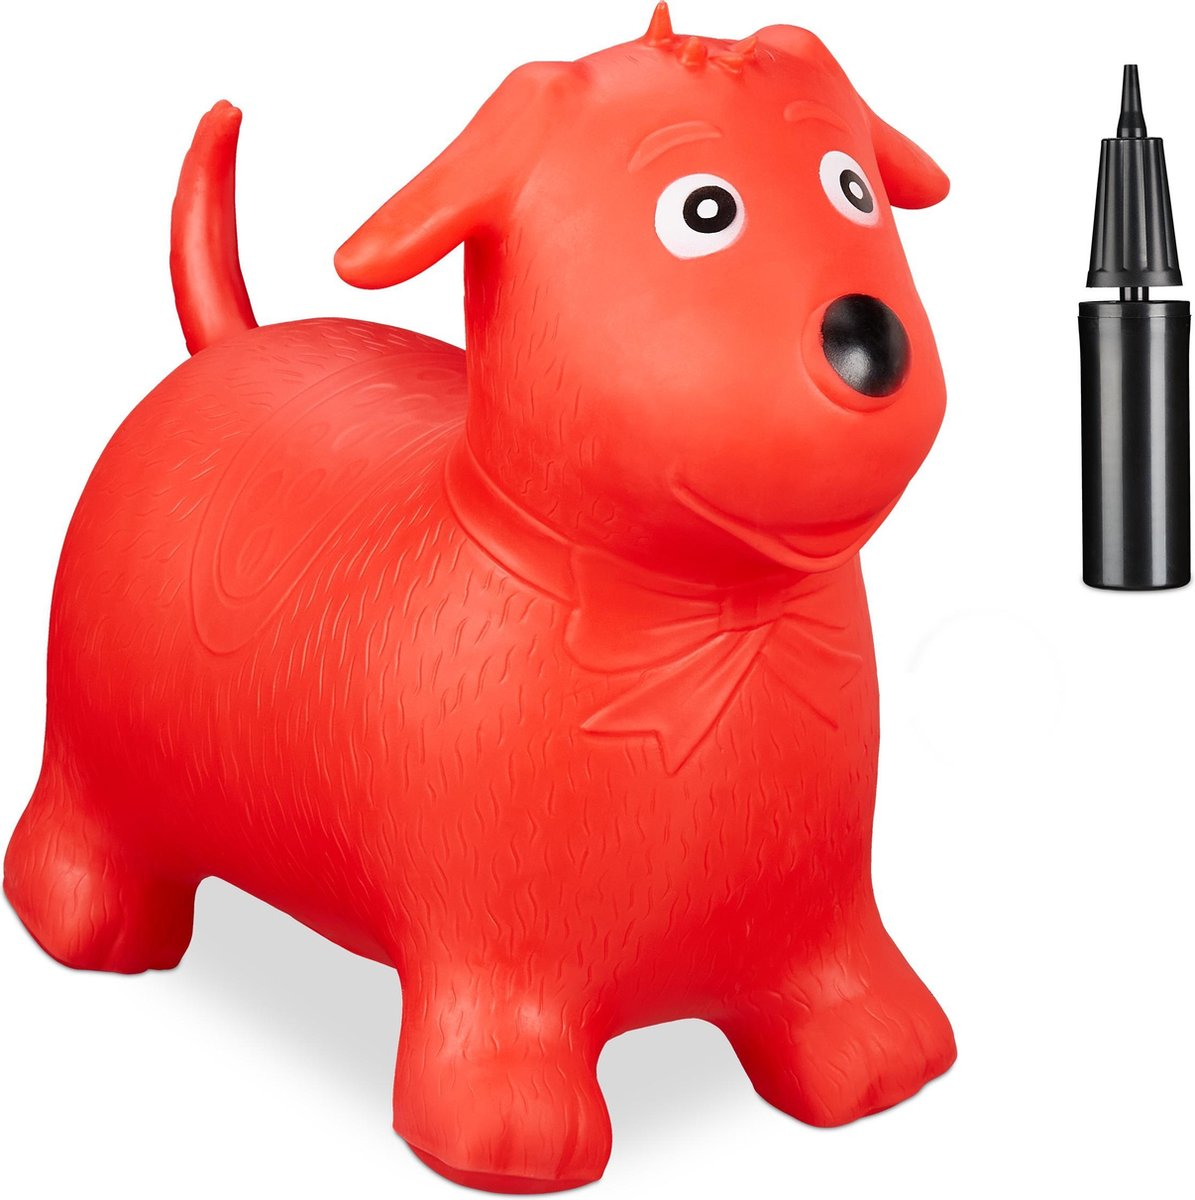 relaxdays Skippy dier hond - skippyhond - springdier - skippybal - tot 80 kg - luchtpompje rood